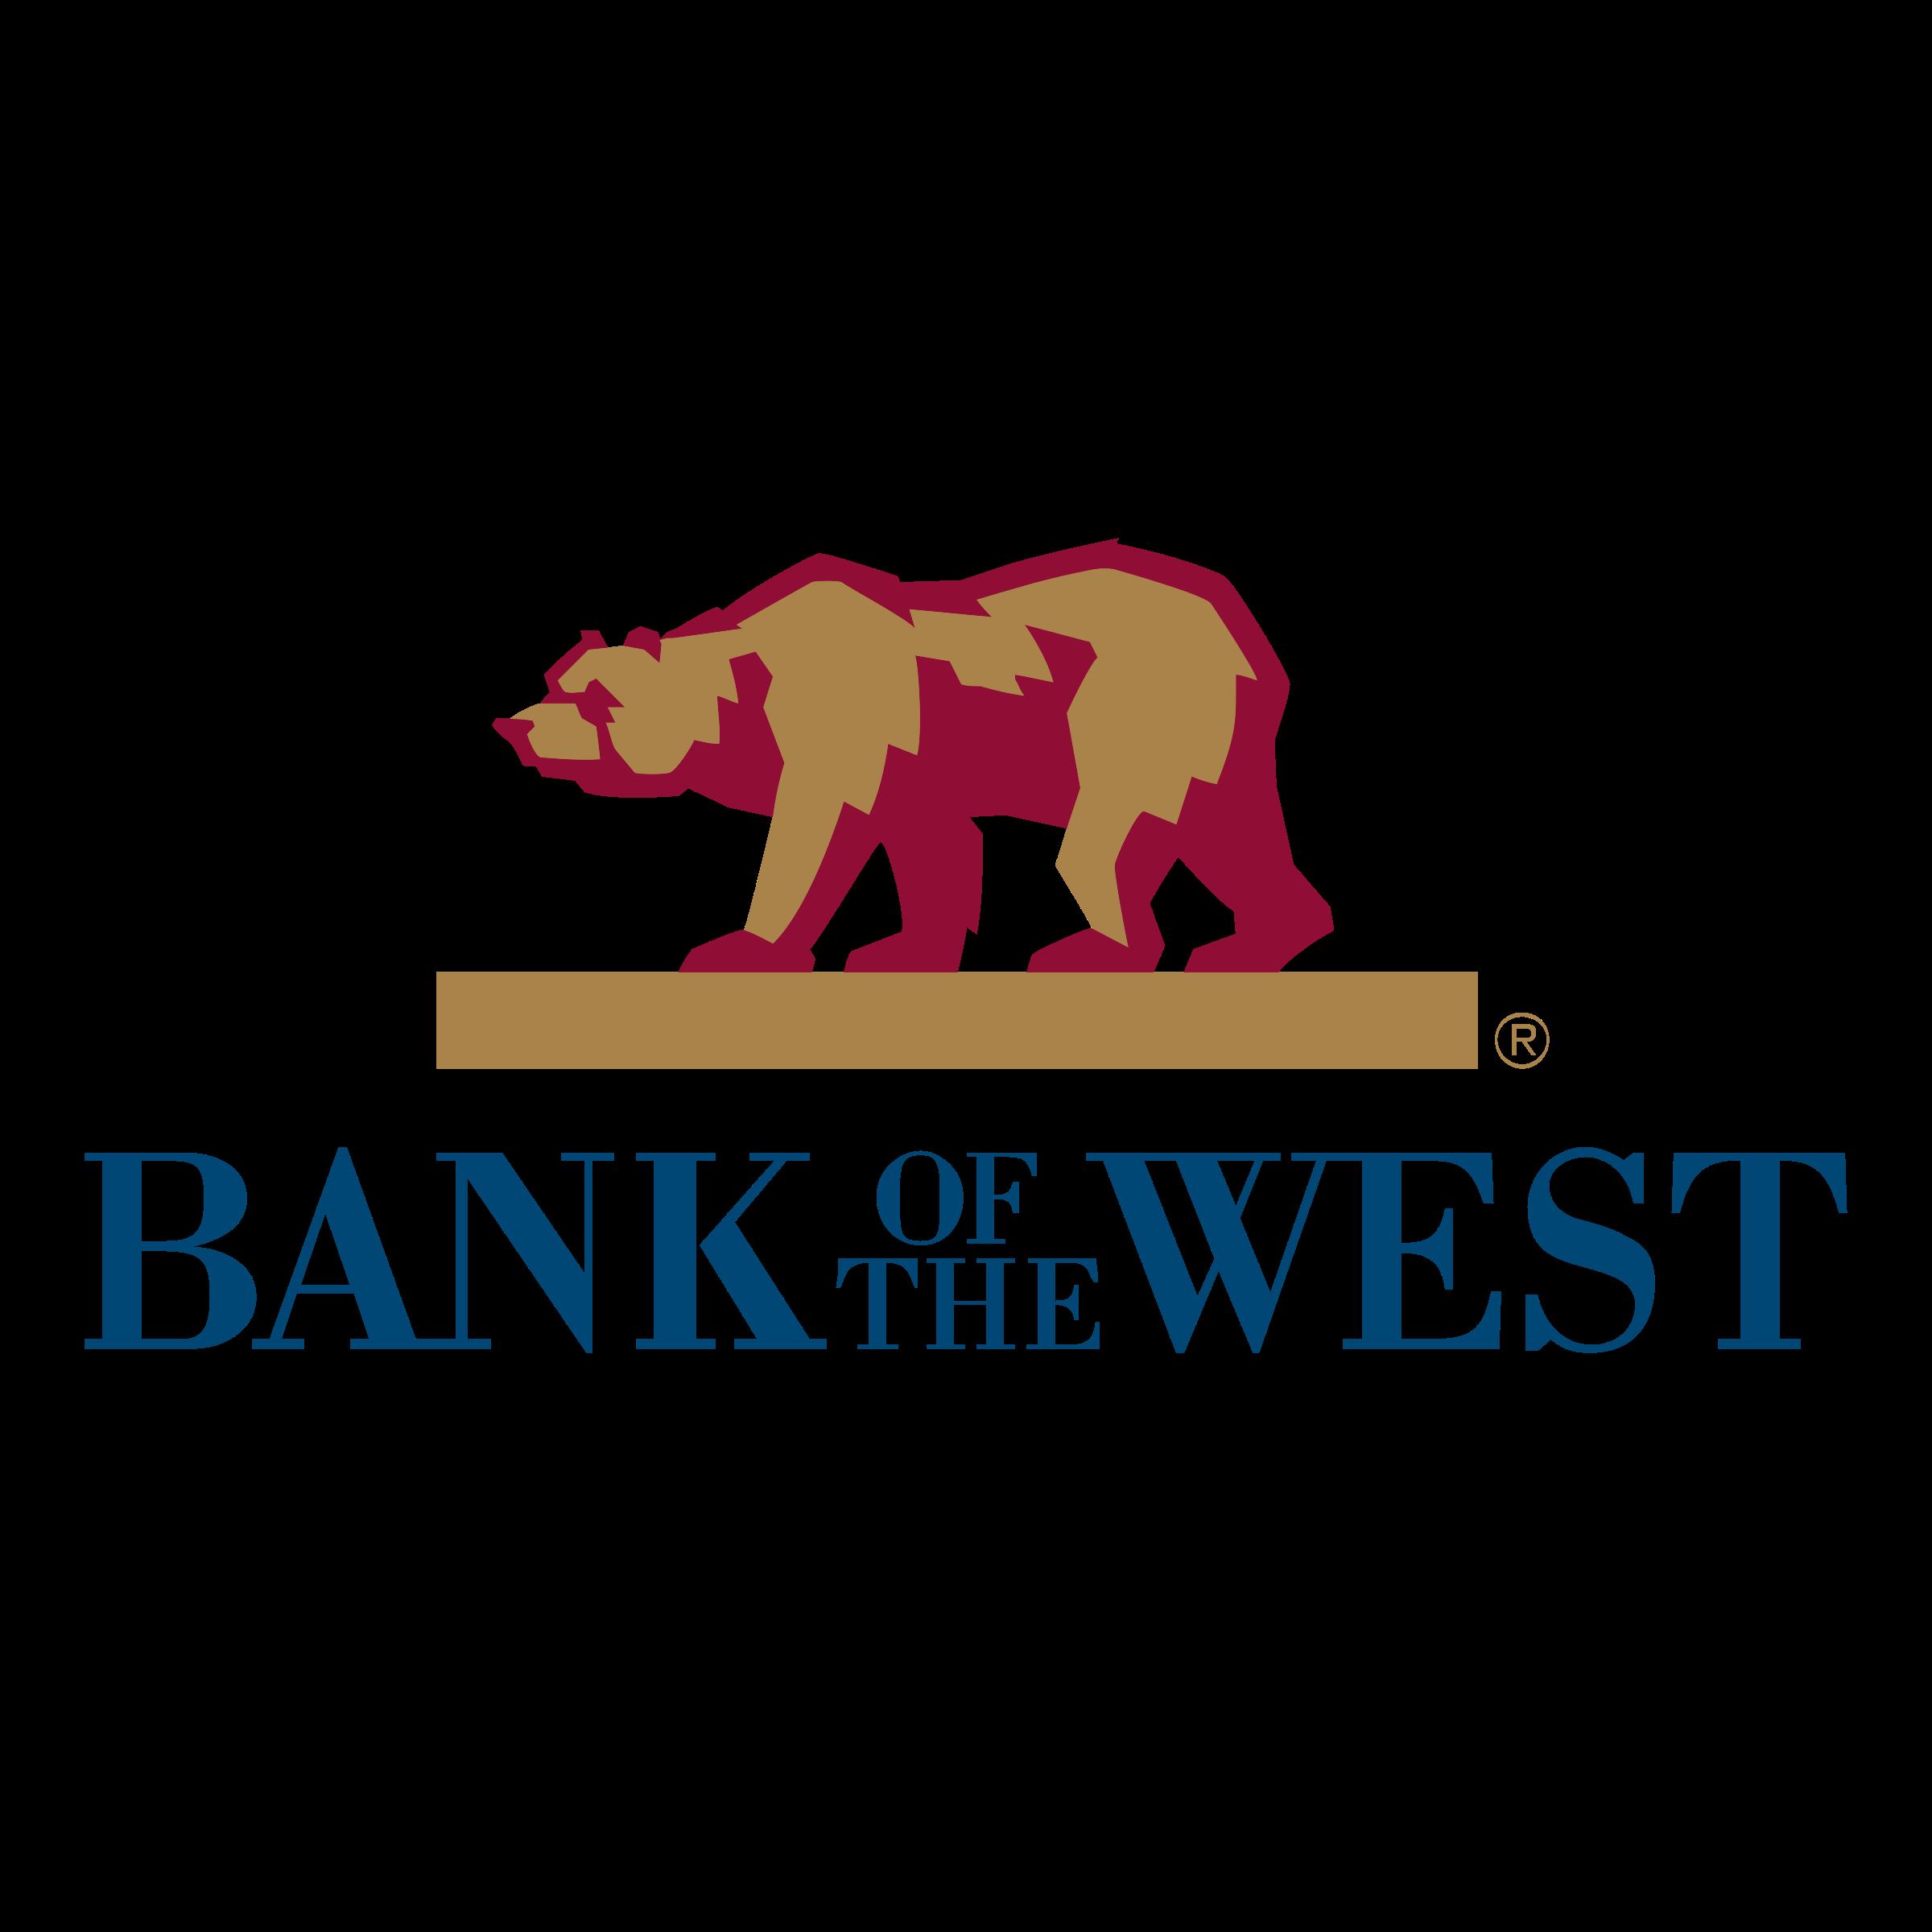 Bank of the West Logo PNG Transparent & SVG Vector.